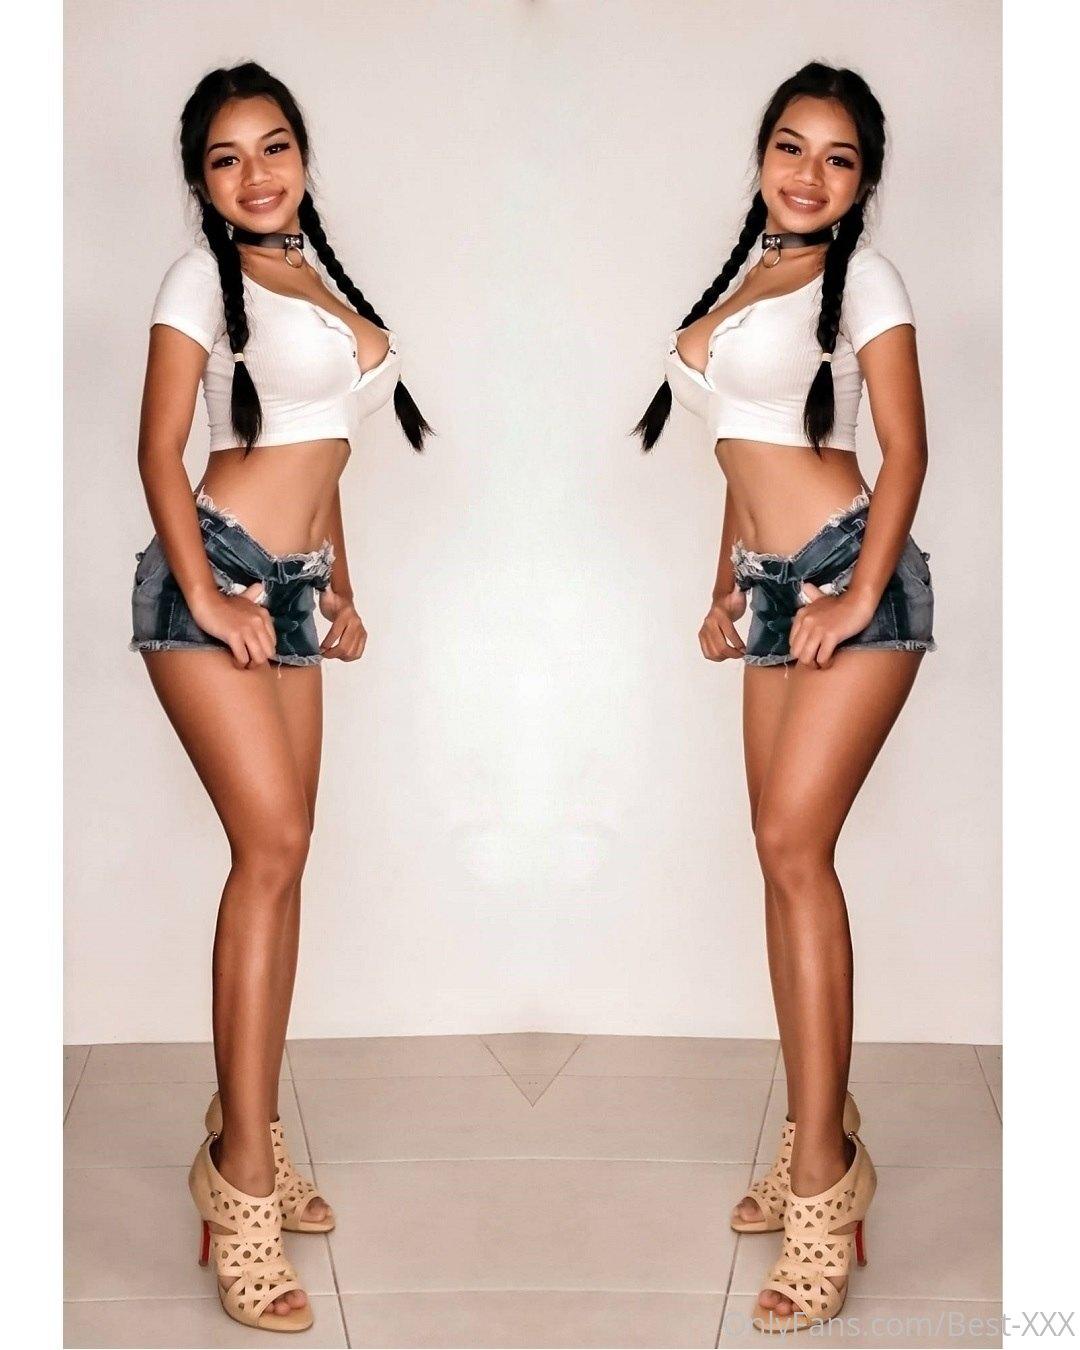 Mo Thai Pattaya Girl Leaked Onlyfans Best Xxx 0138